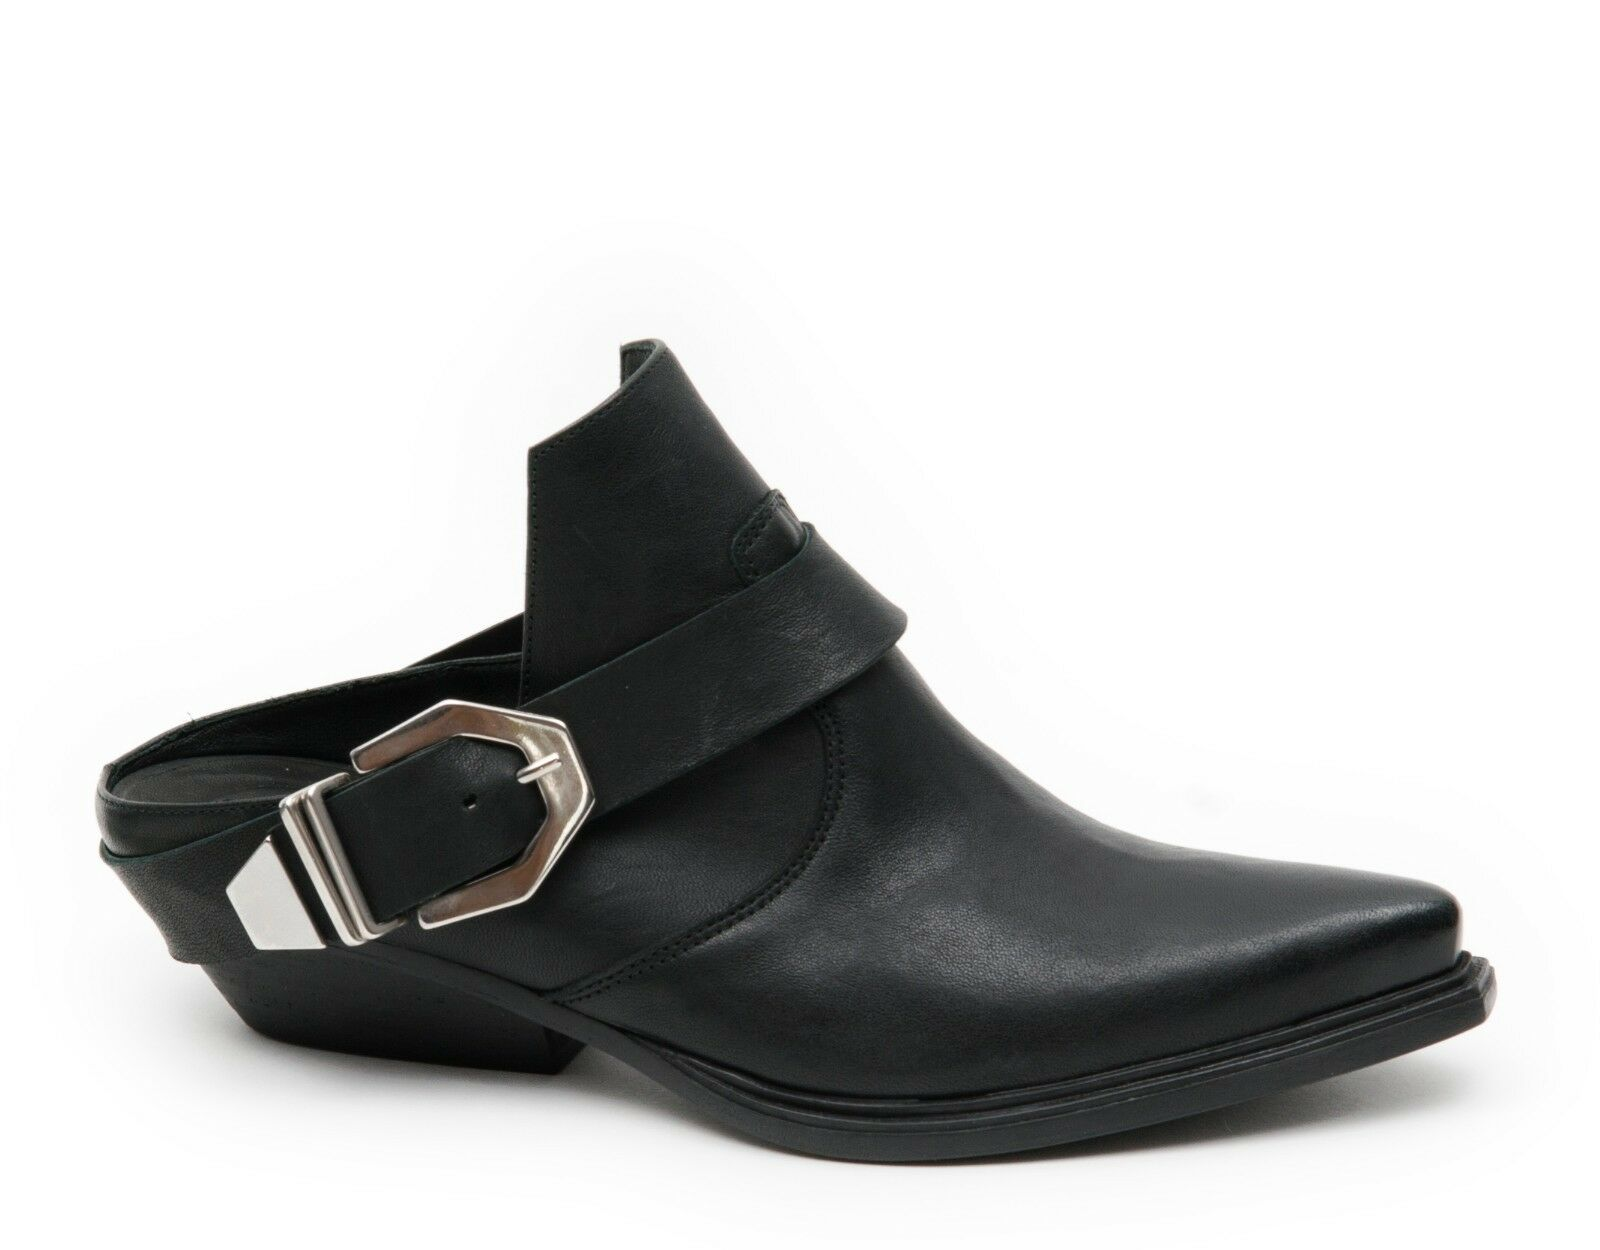 Zapatos casuales salvajes Vic genuina sabots sabot zapato bajo Black 1q4996dq31p140101 Black bajo reduce negro 50b216